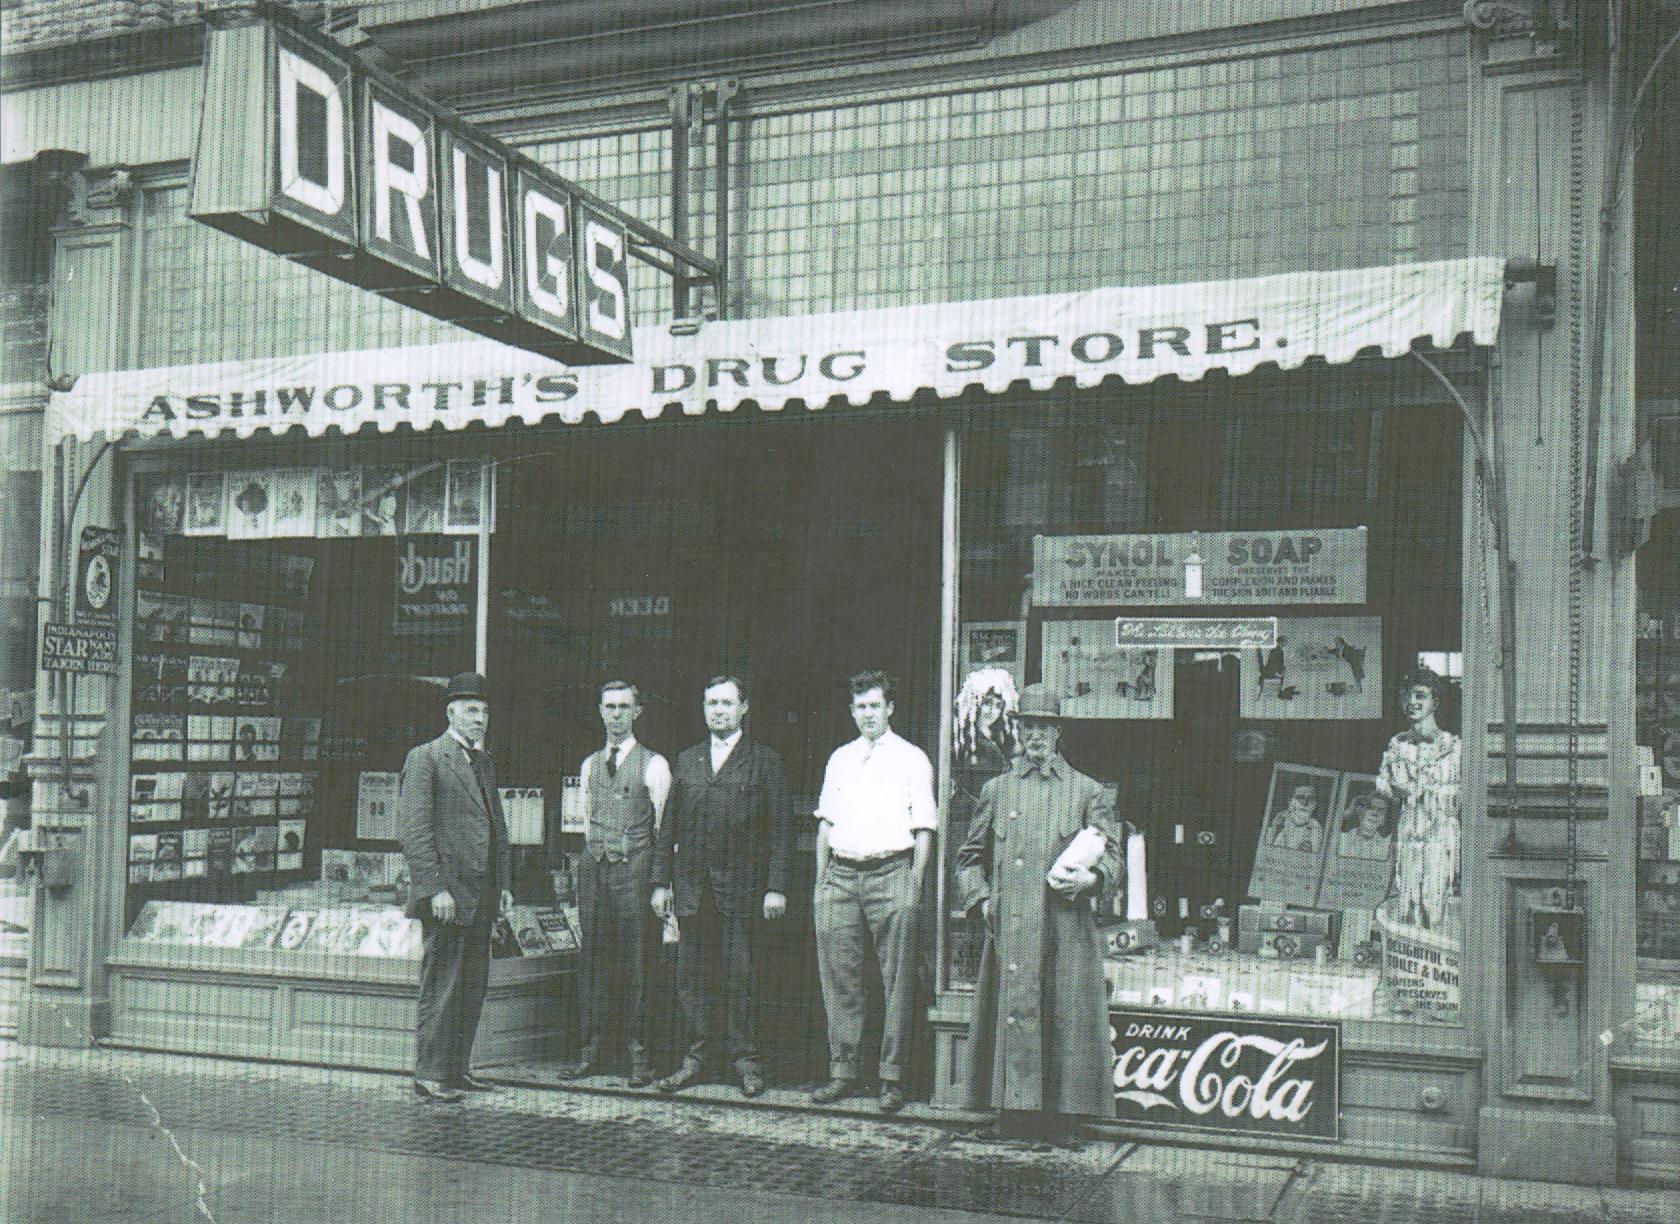 ashworth's Drug store.jpg